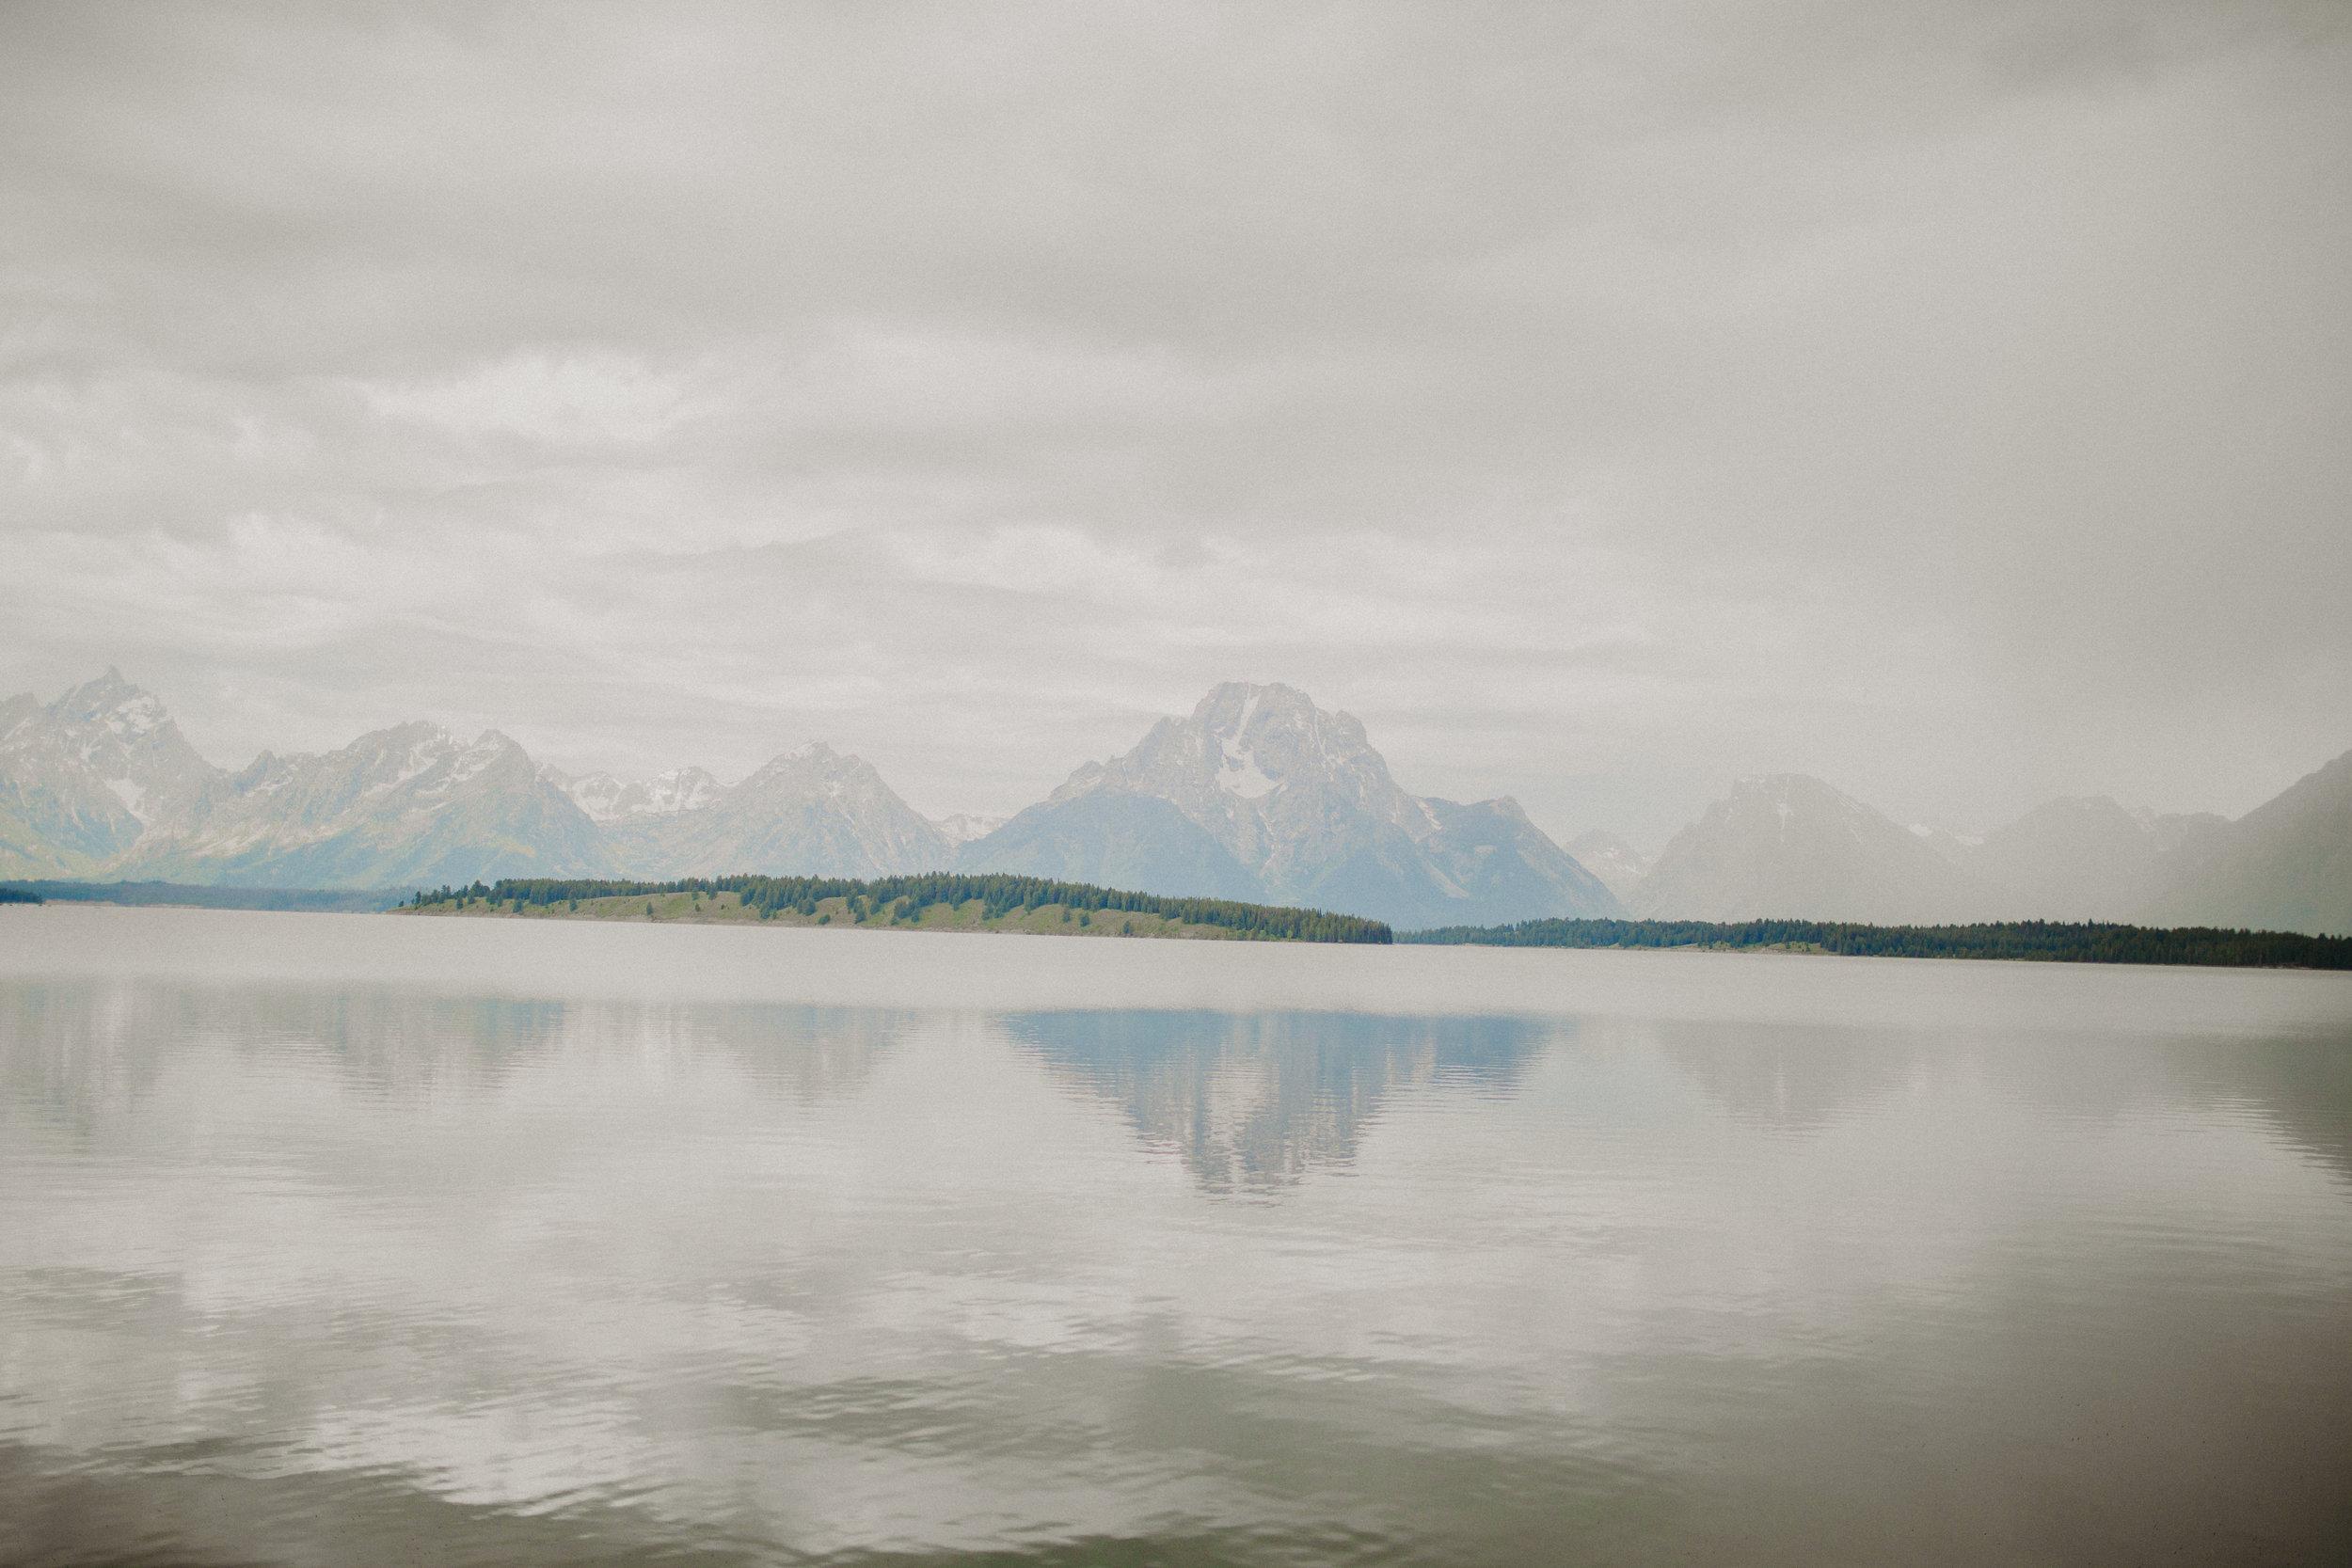 Tetons-Idaho-48.jpg